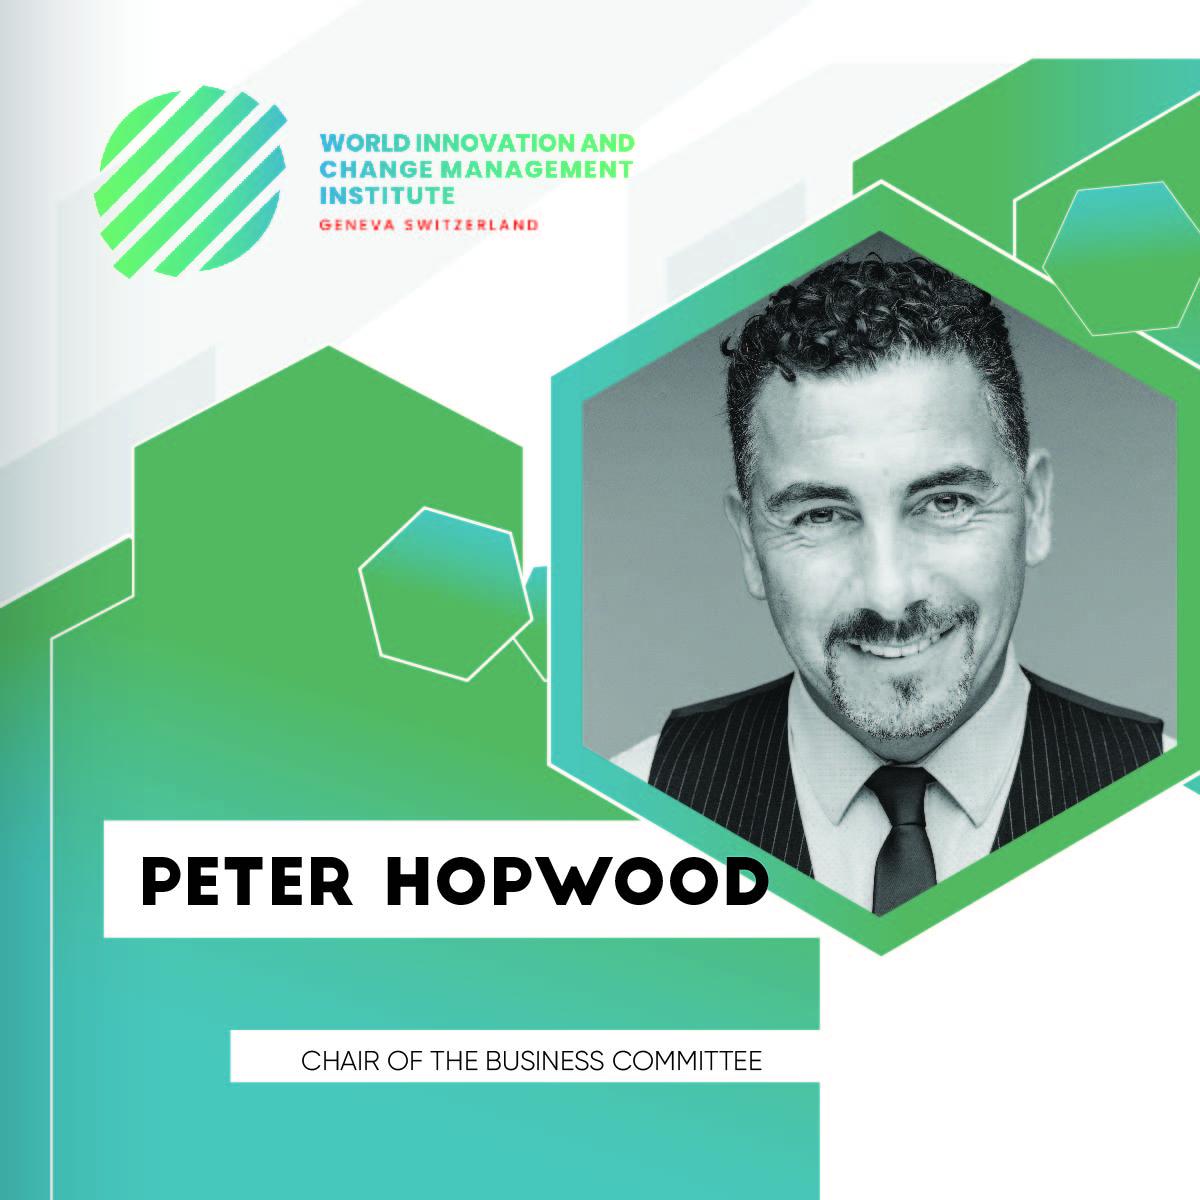 Peter Hopwood